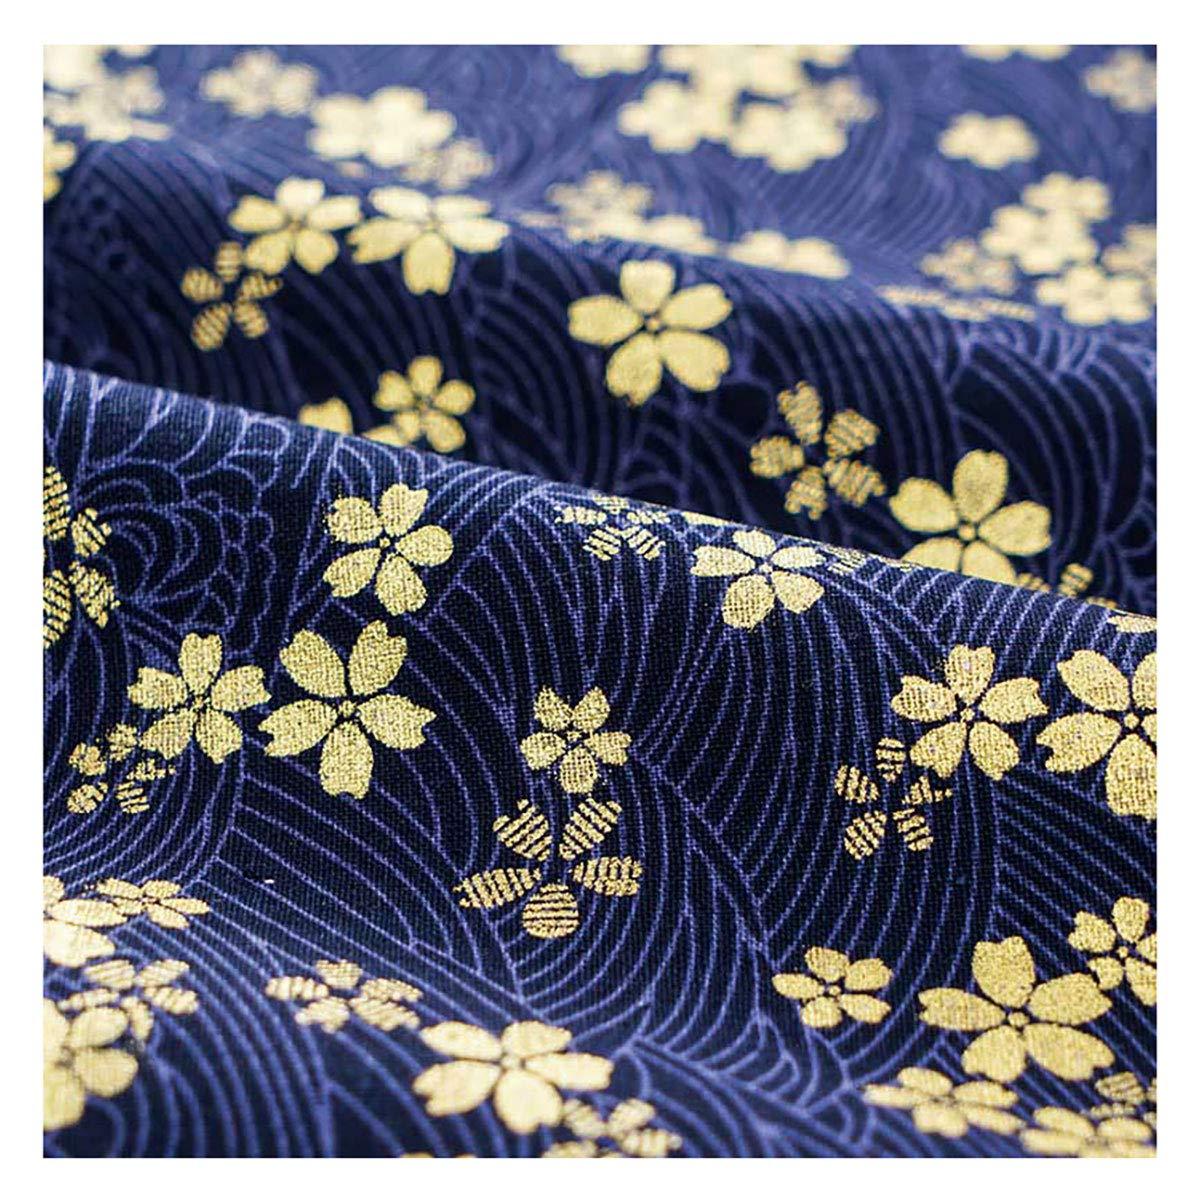 Sakura Waves Cotton Sewing Fabric for Kimono Cheongsam and Bag DIY 17.7 x 17.7 Furoshiki Cloth Queenbox Japanese Printed Fabric